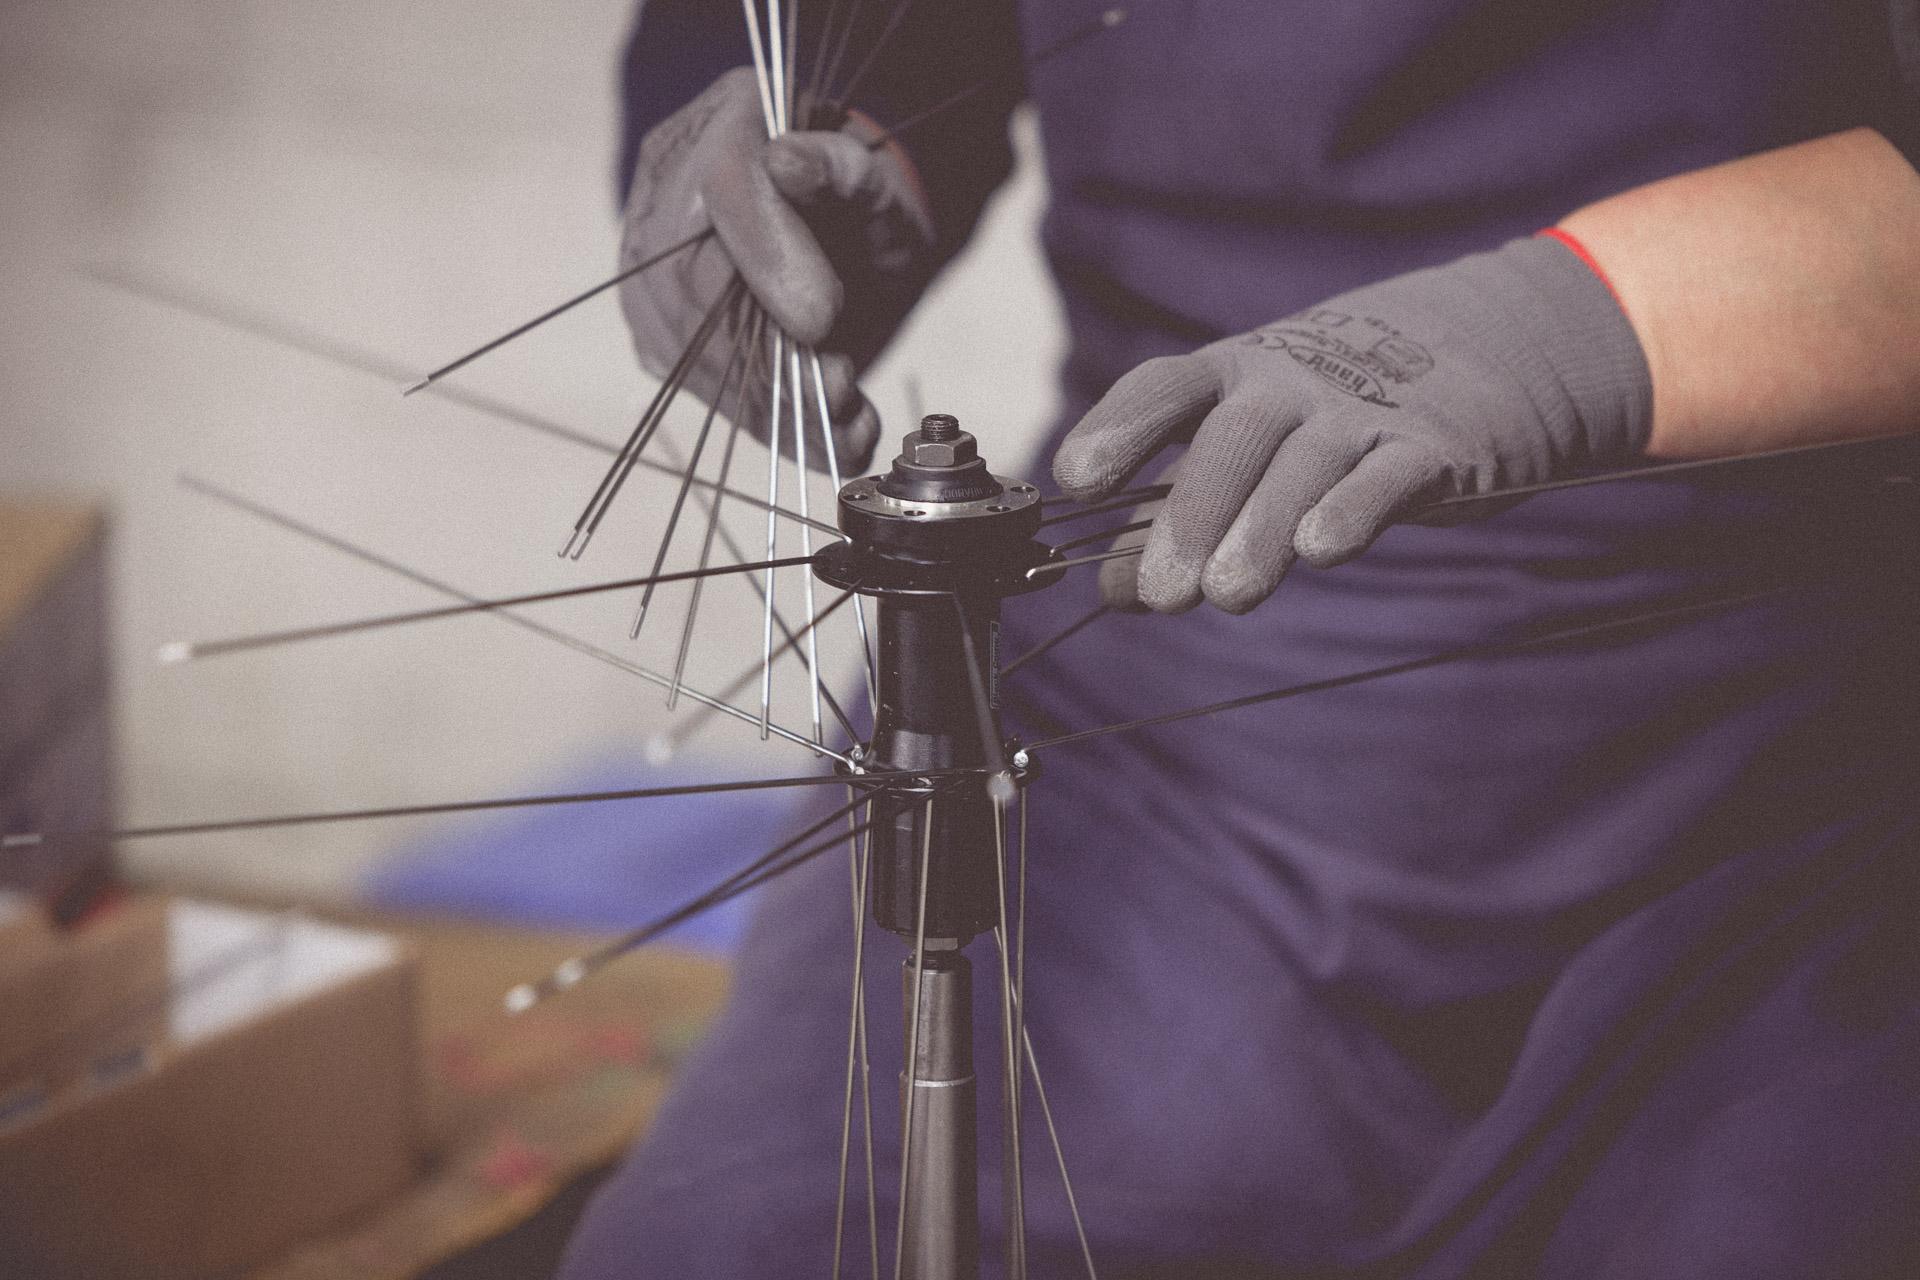 18-Derby-Cycle-Werke-Fahrradproduktion